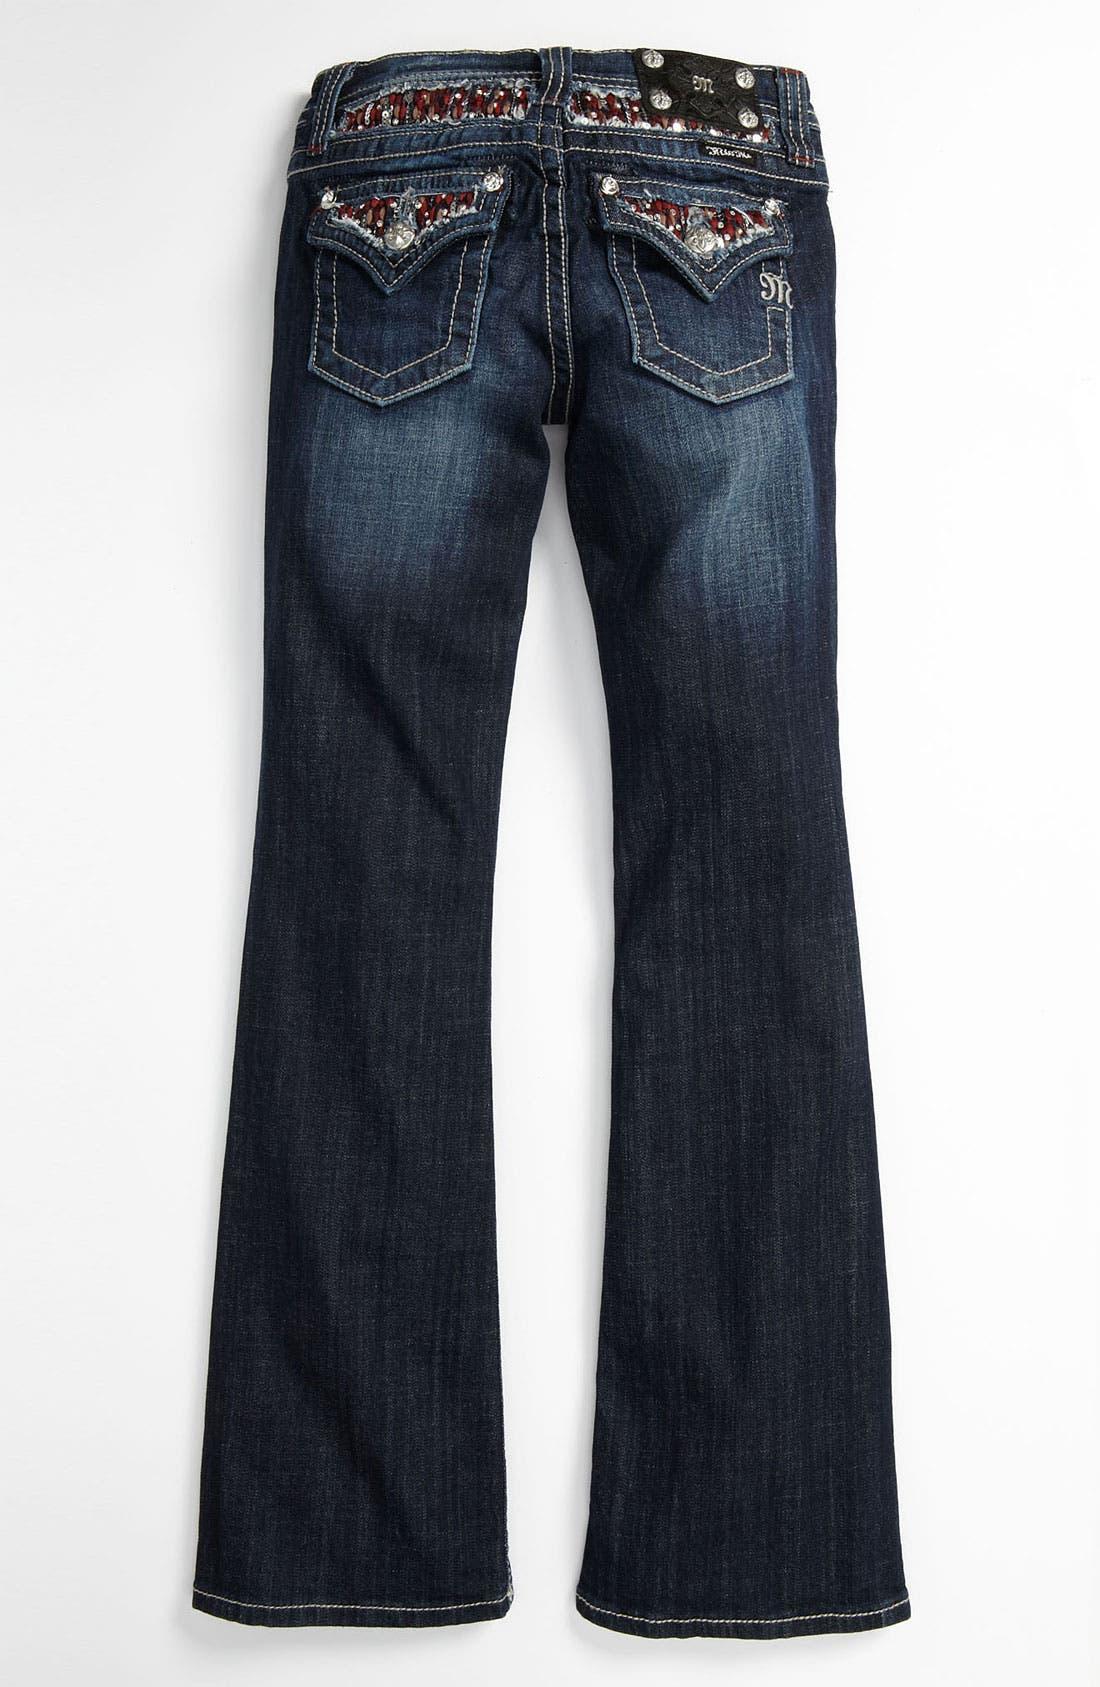 Alternate Image 1 Selected - Miss Me Embellished Bootcut Jeans (Big Girls)